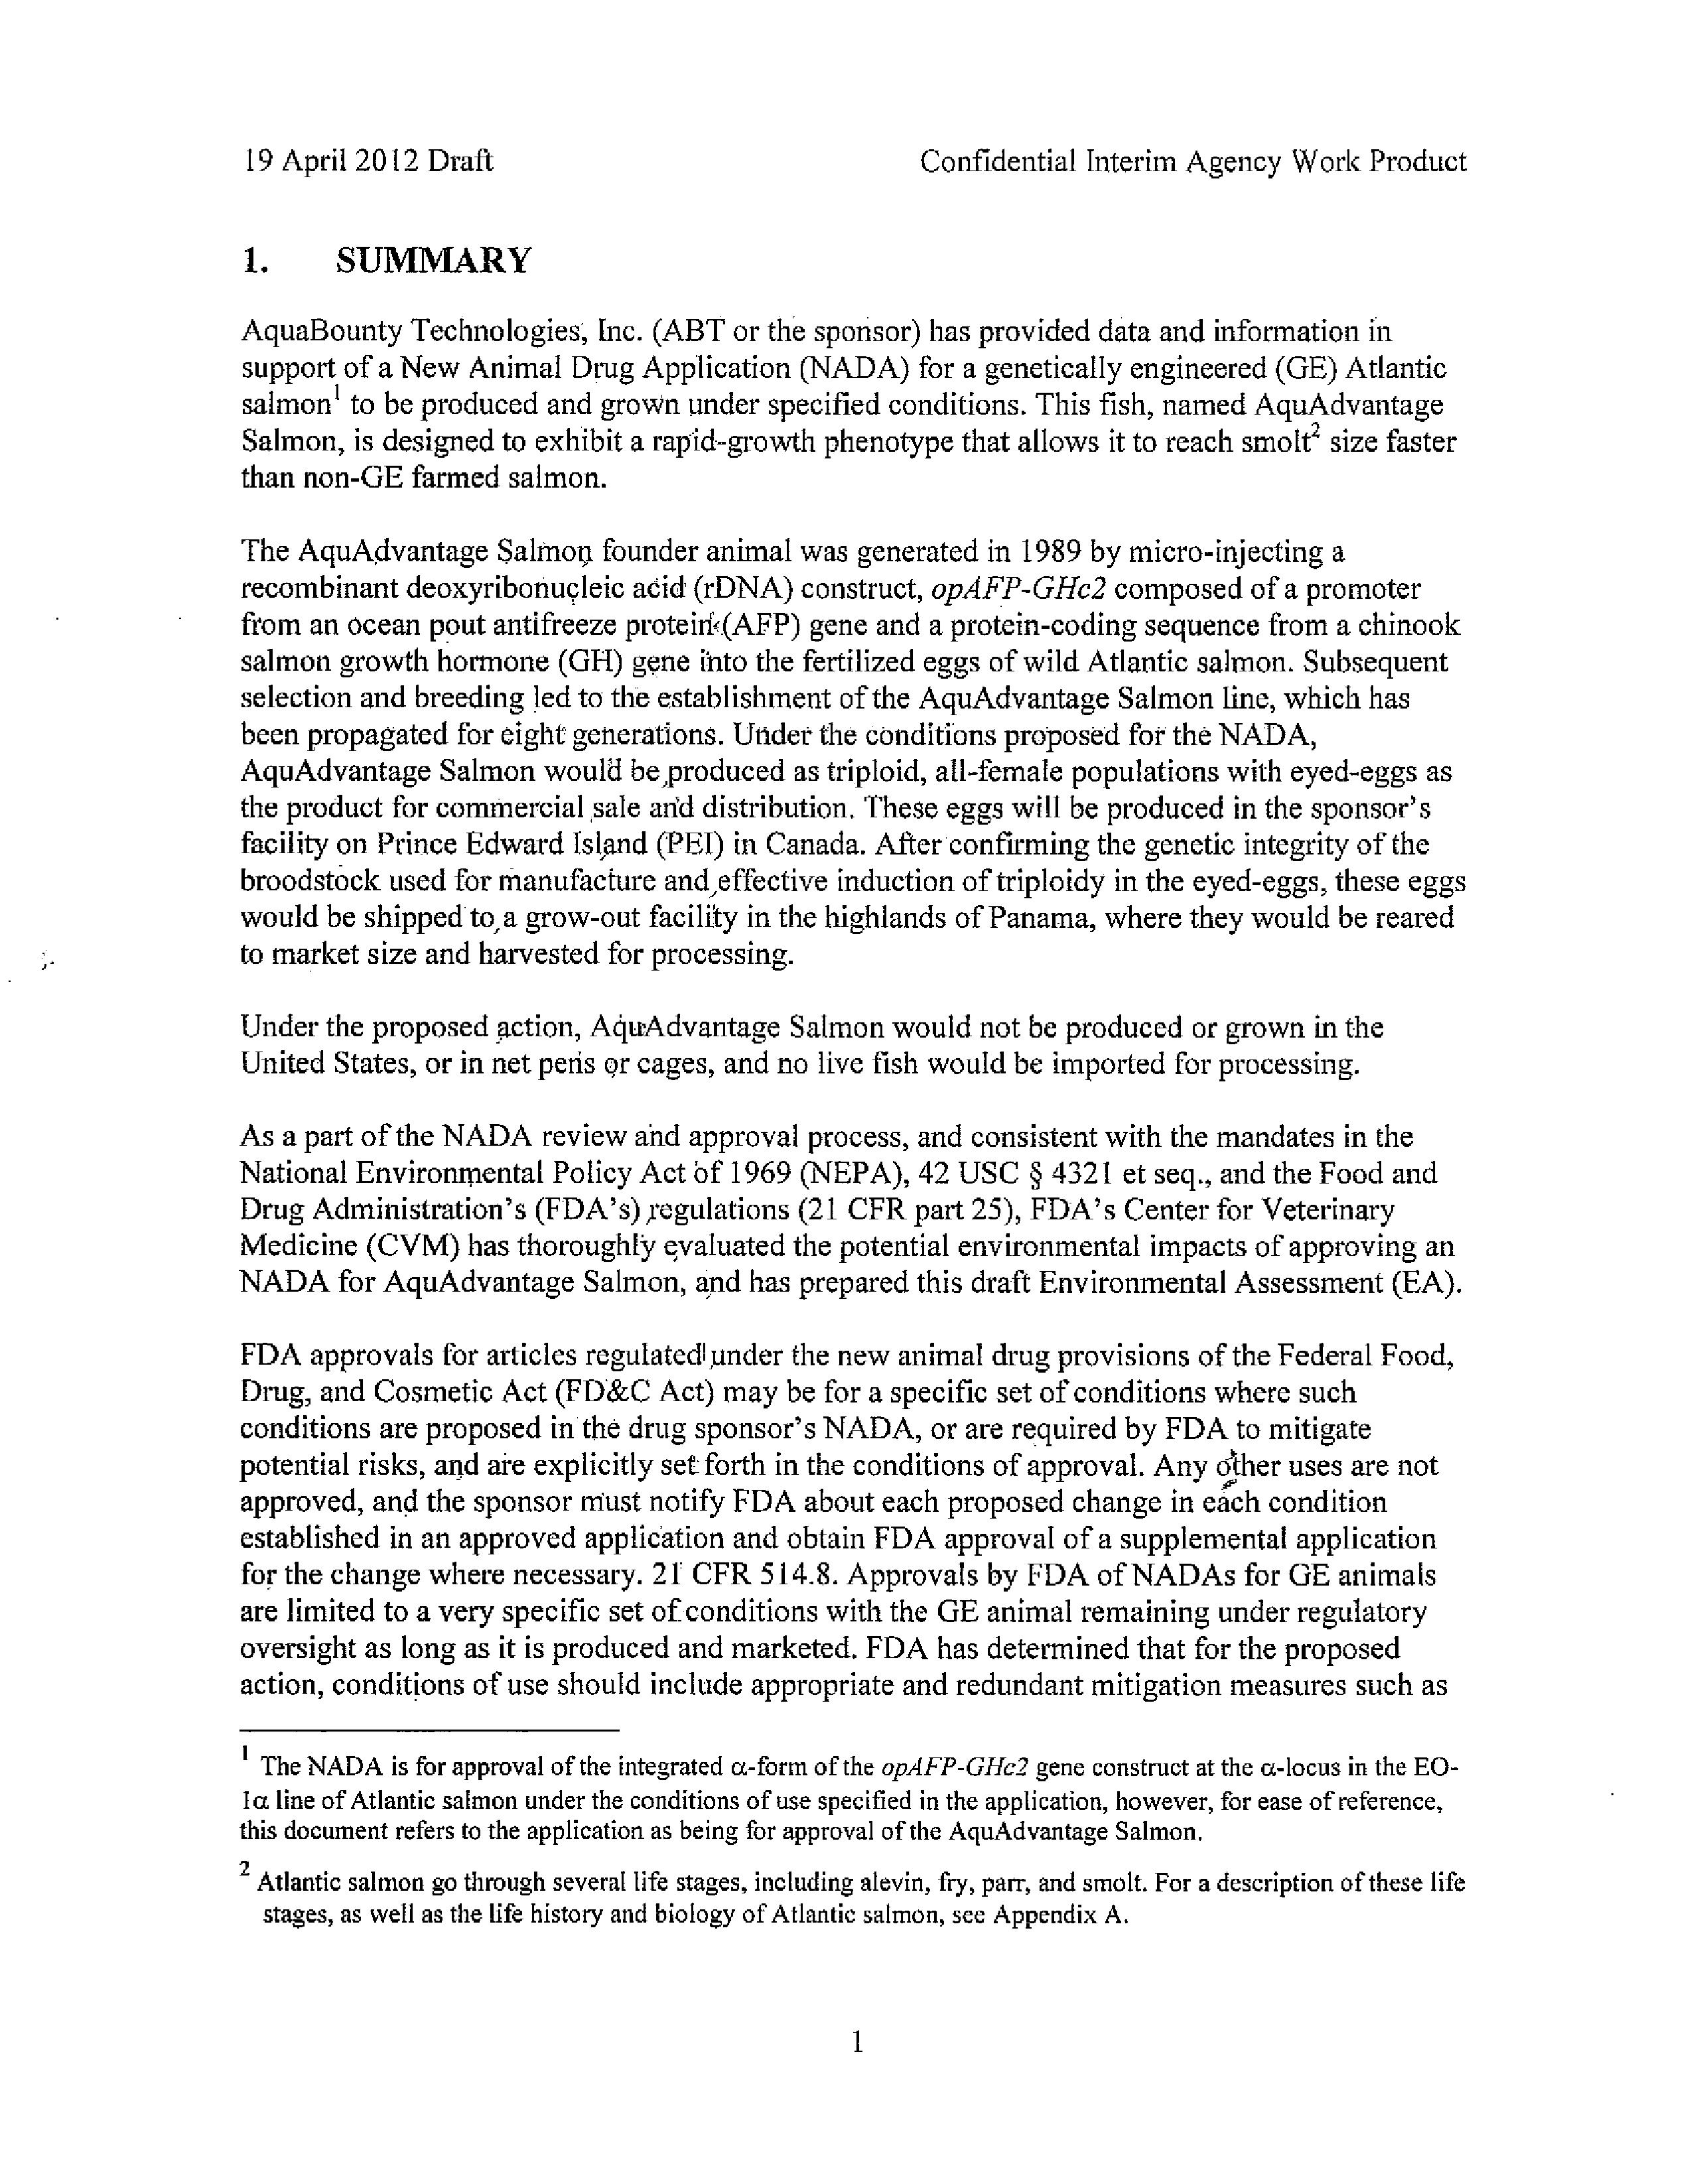 AquaBounty Draft Environmental Review001